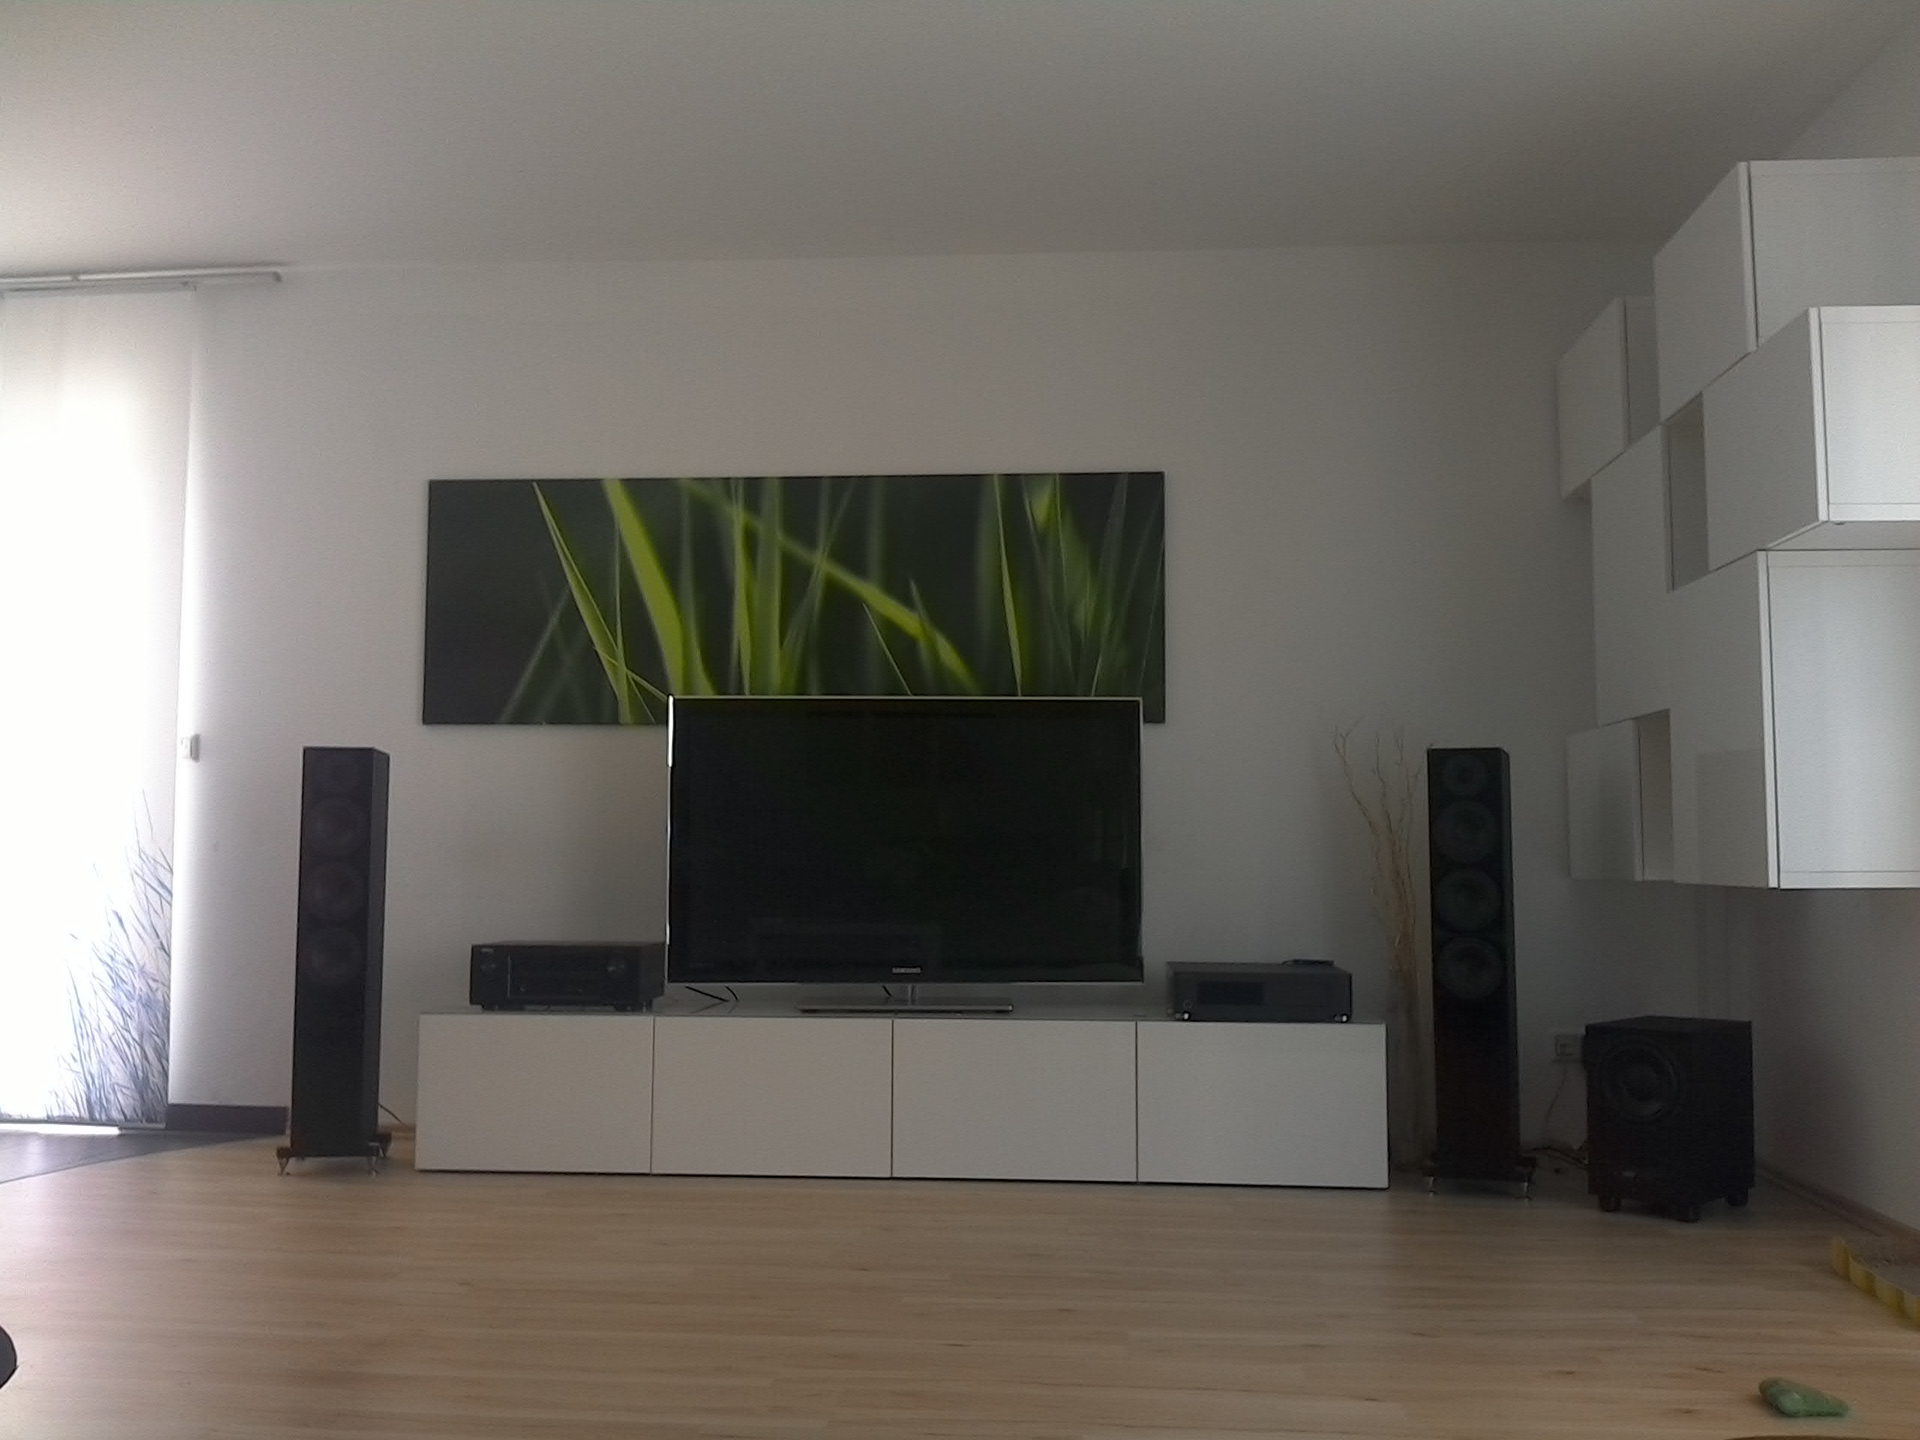 aw ecke aw ecke hifi bildergalerie. Black Bedroom Furniture Sets. Home Design Ideas